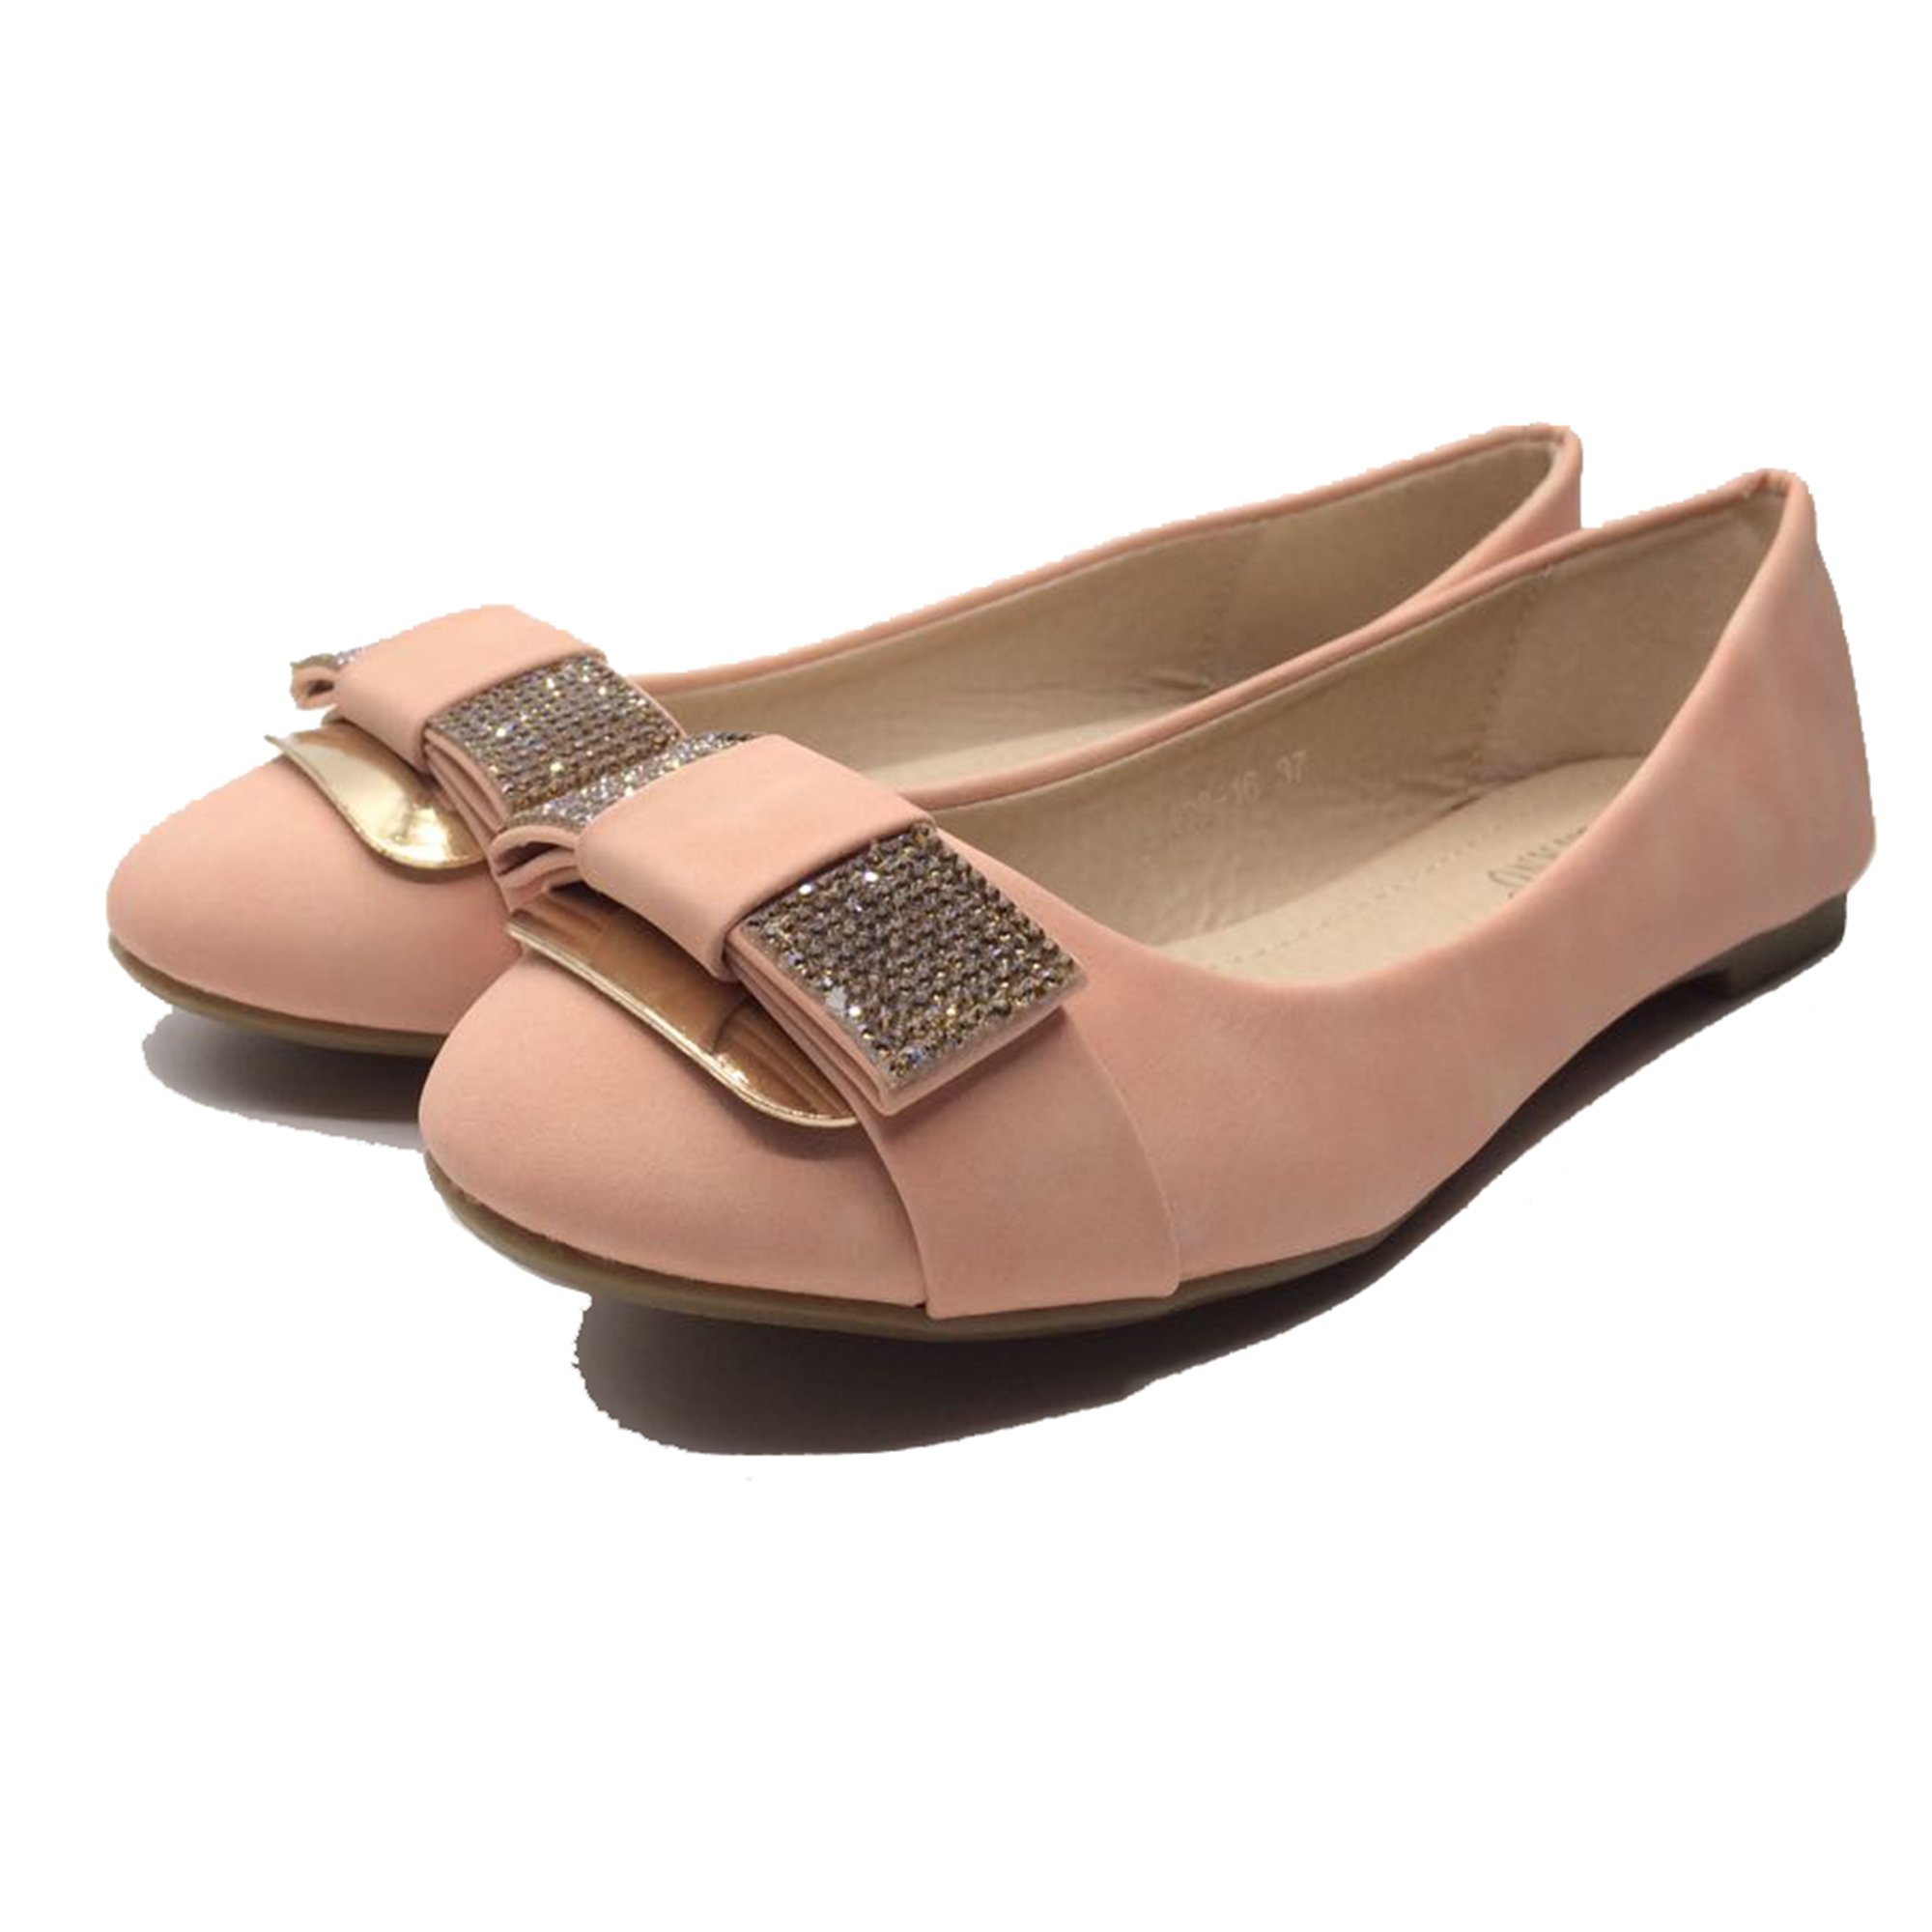 Ballerine Chaussures Scarpe Basse Verdi Donna PlatesBallerines MqUpSzV